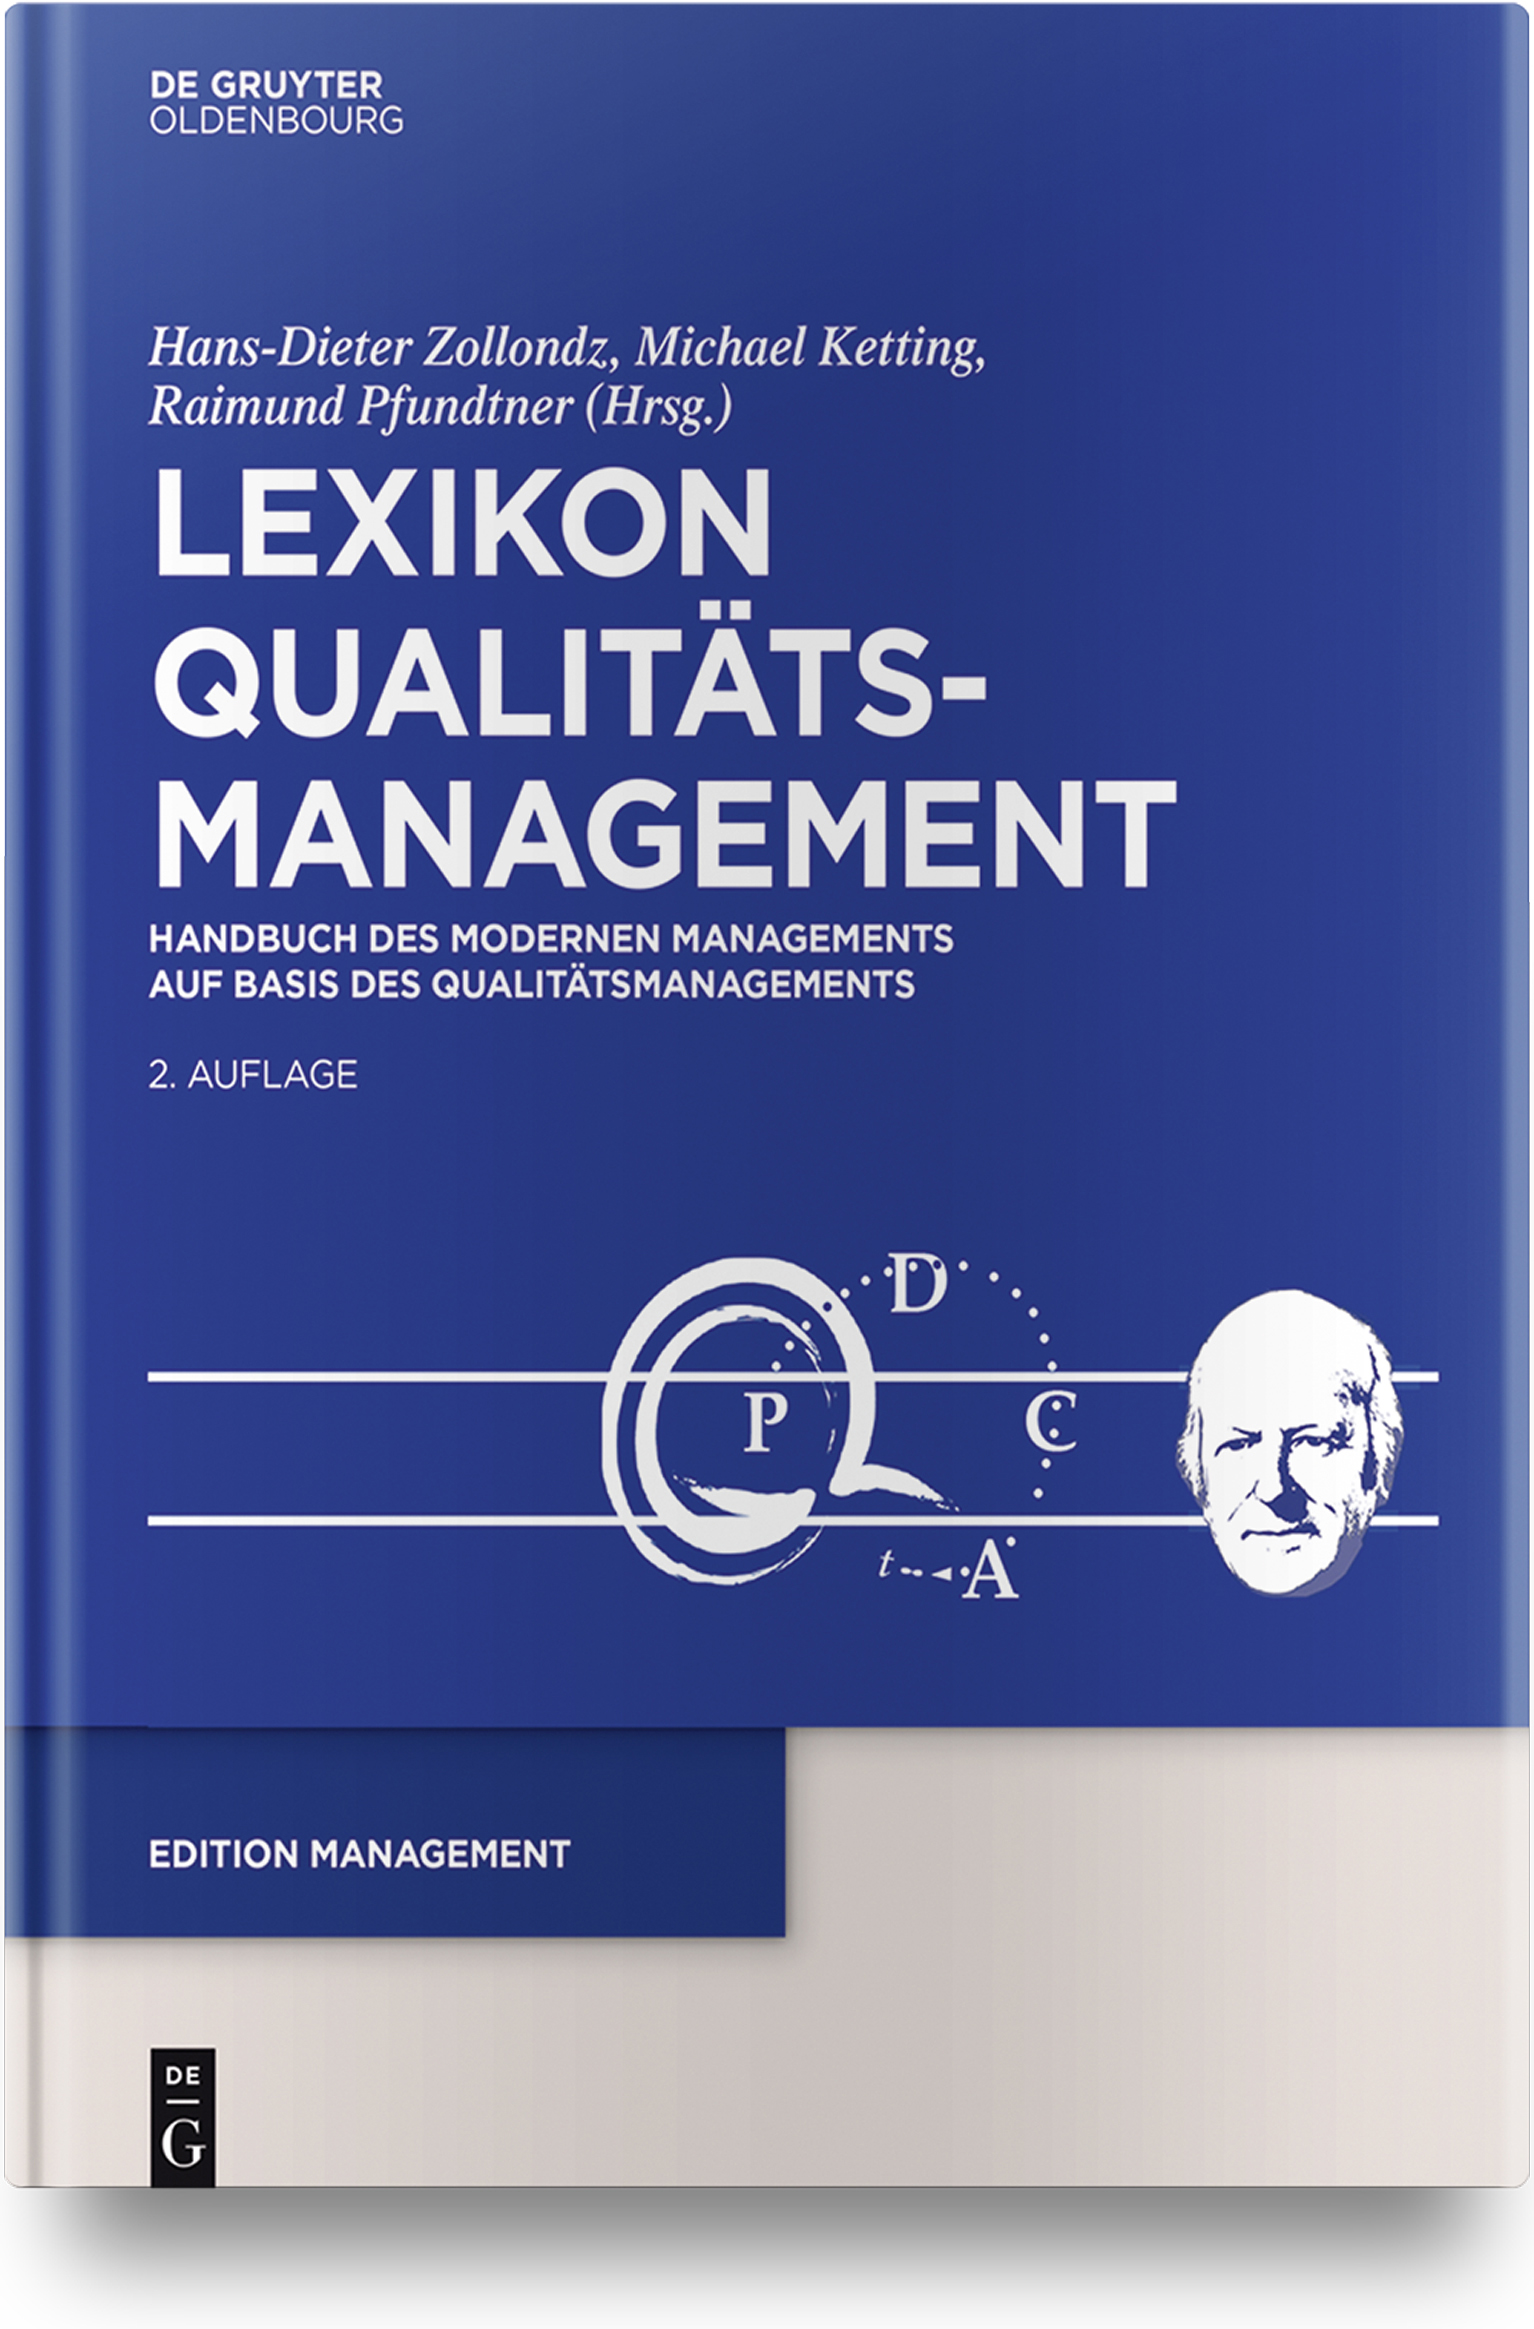 Lexikon Qualitätsmanagement: Handbuch des Modernen Managements auf der Basis des Qualitätsmanagements, 978-3-446-46031-7